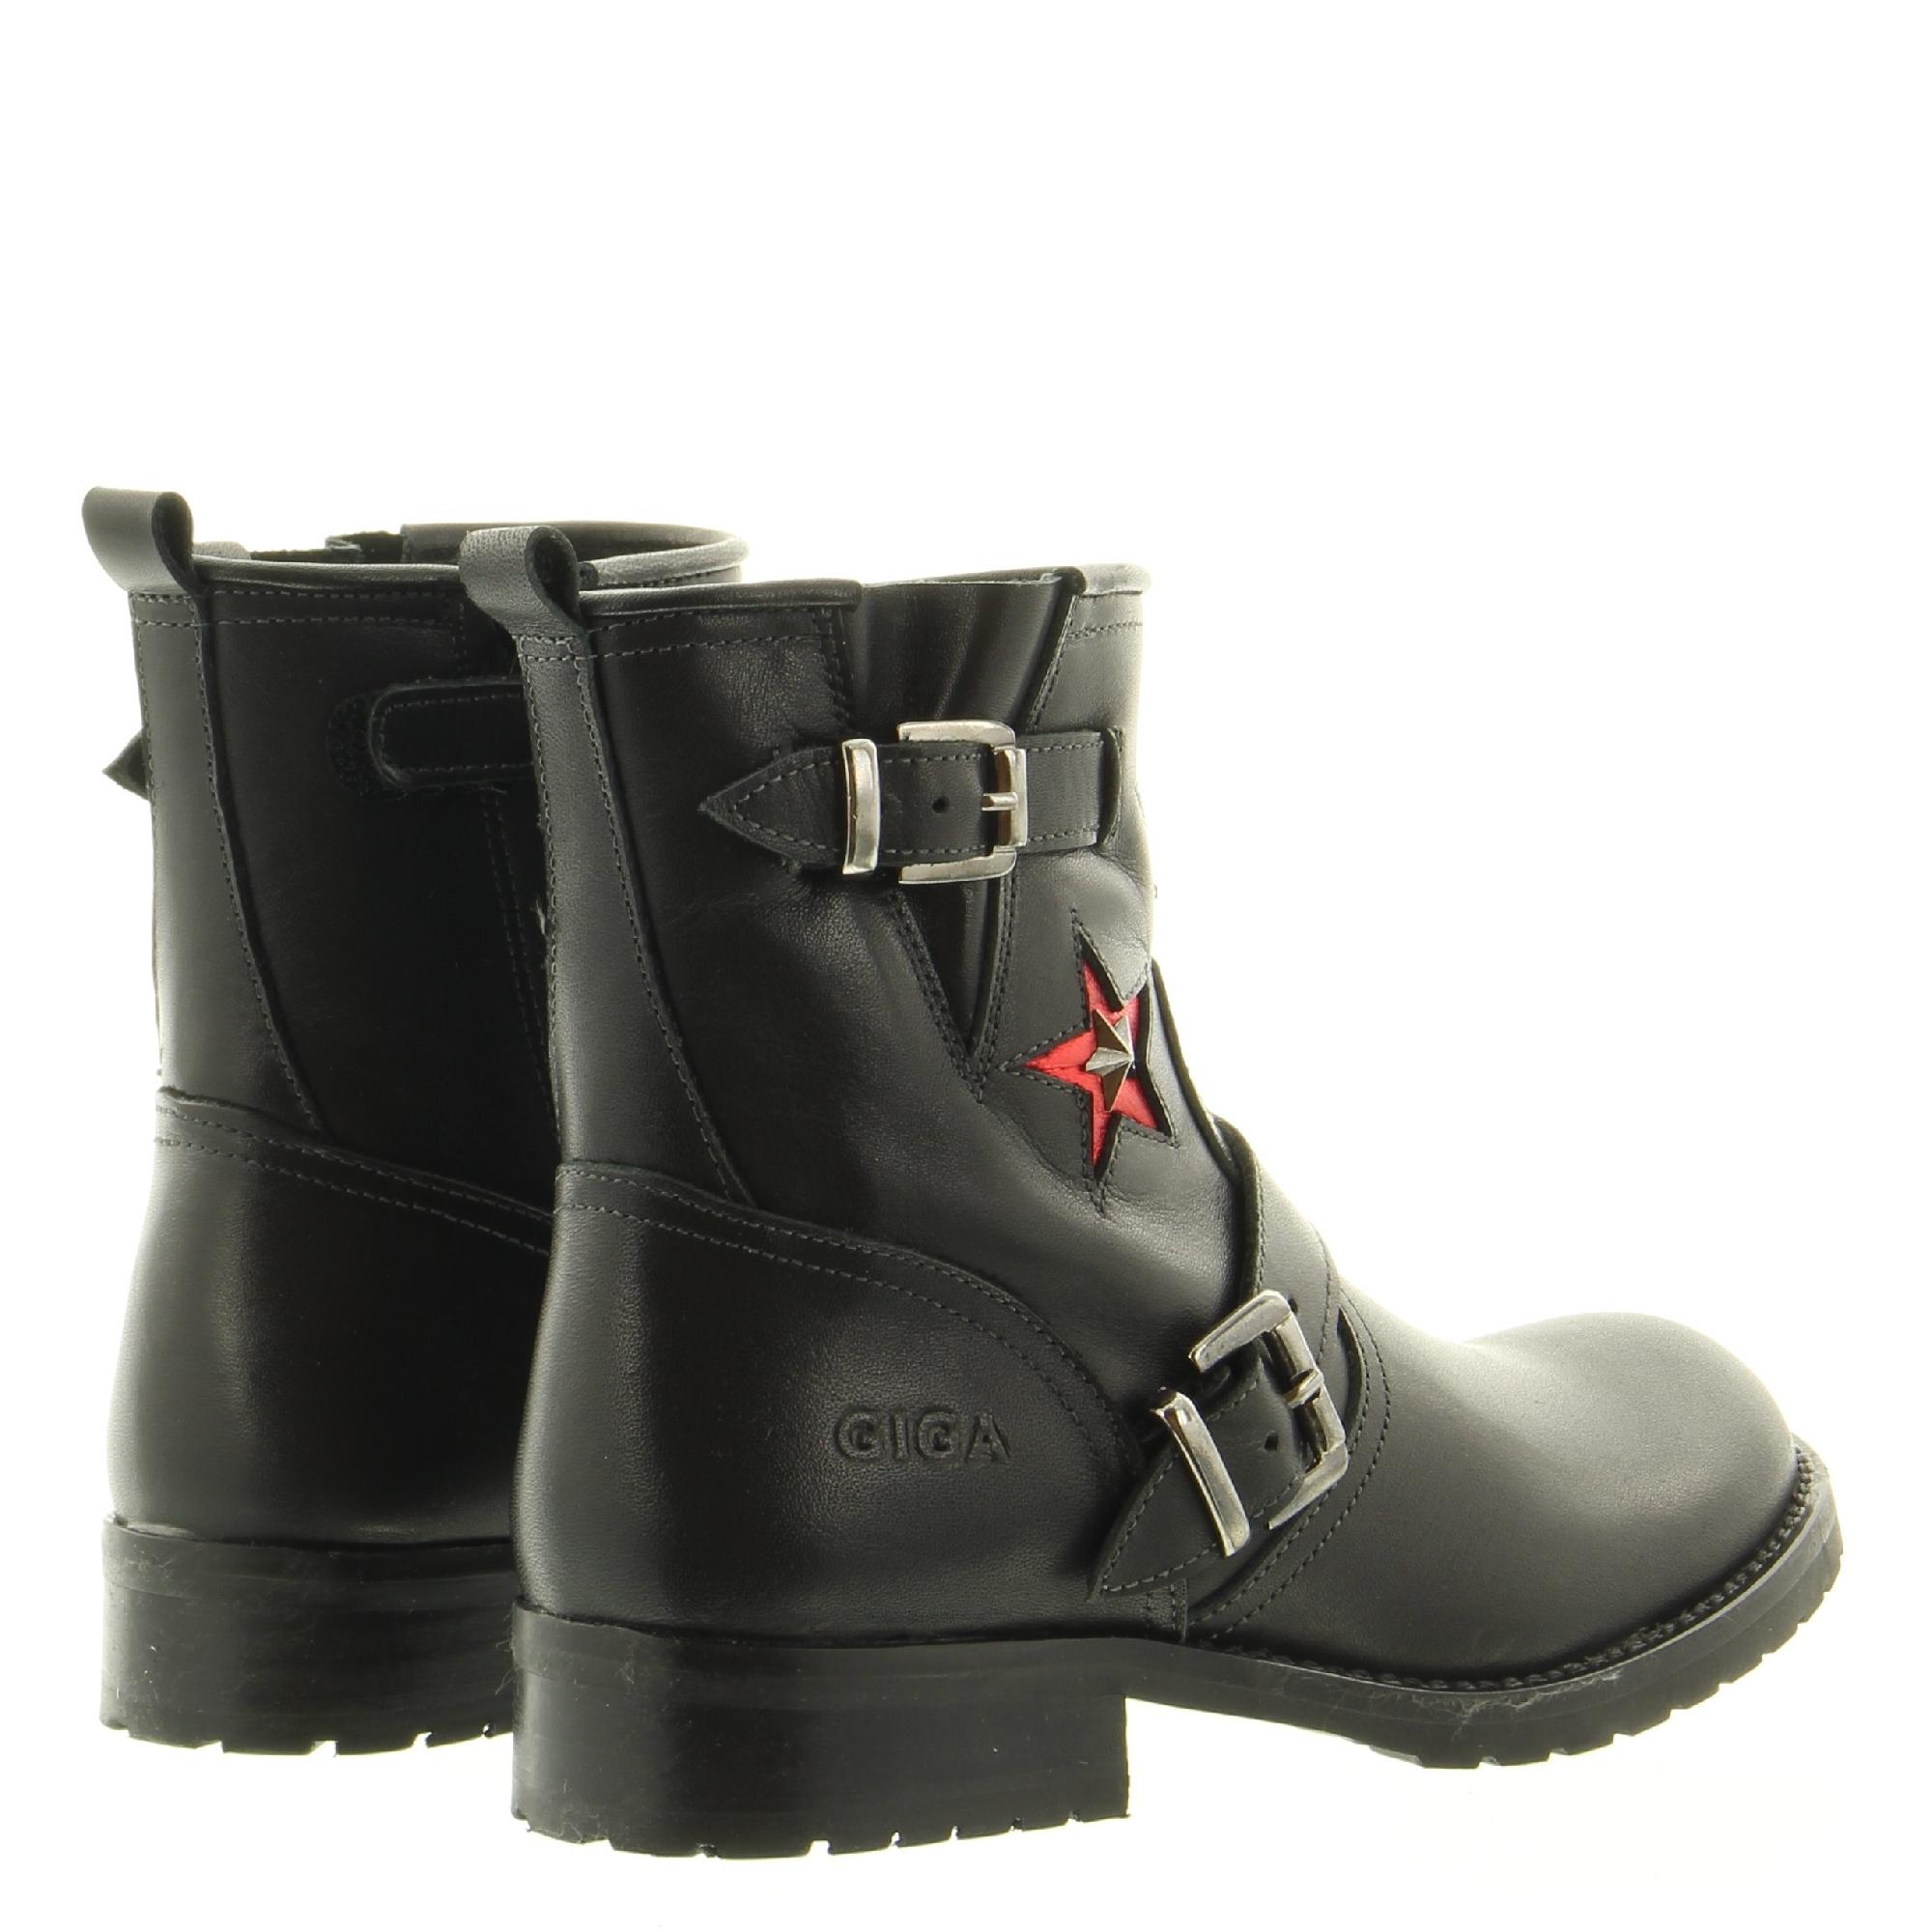 Giga G3122 B11K14 Black Ibercrust Rojo